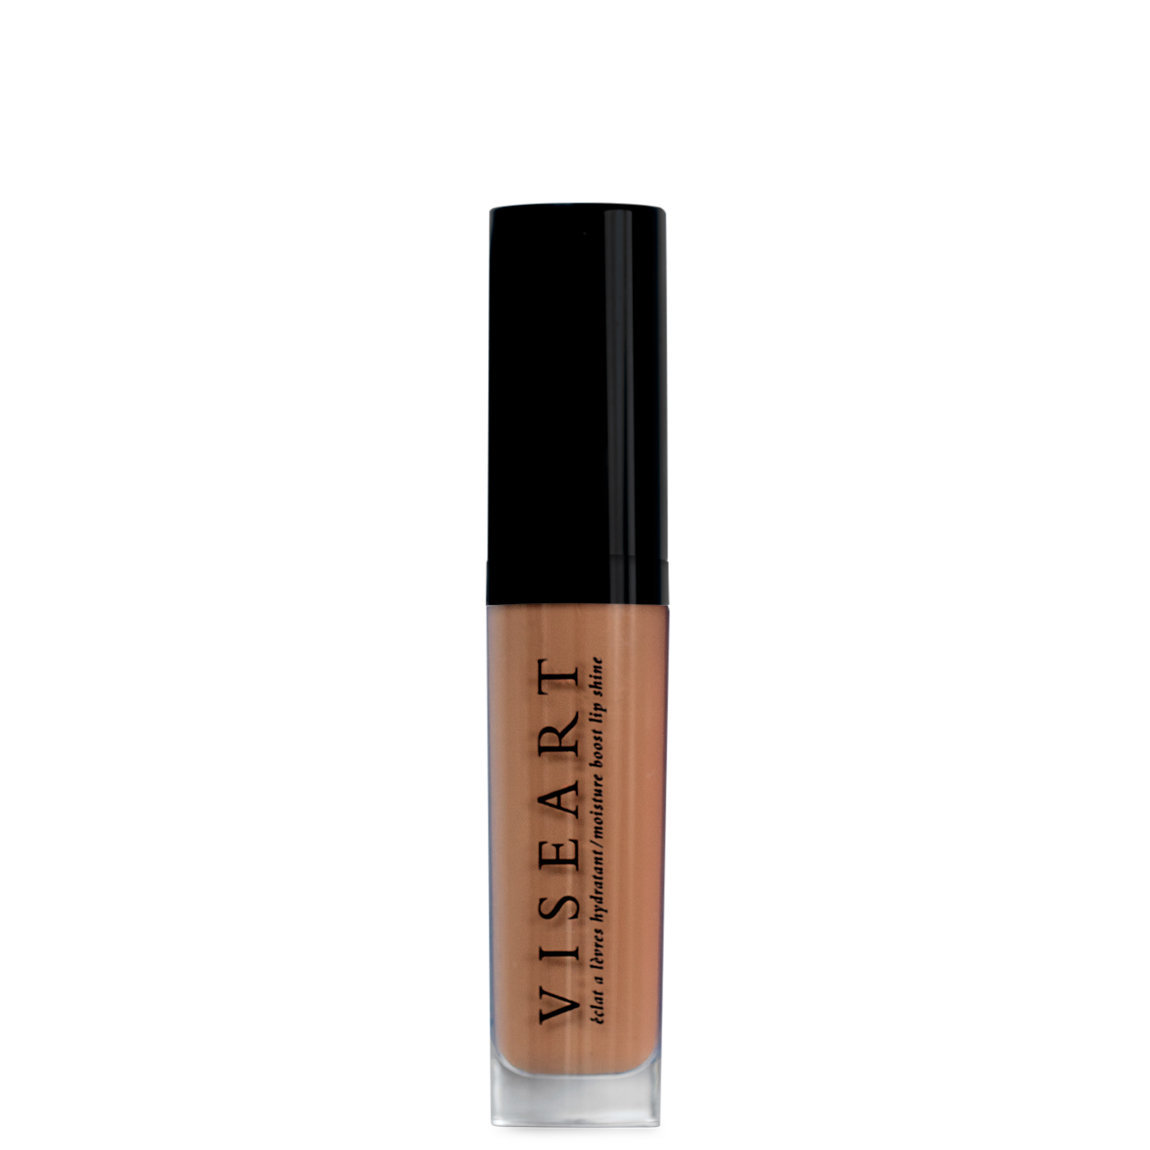 Viseart Moisture Boost Lip Shine Beignet alternative view 1.